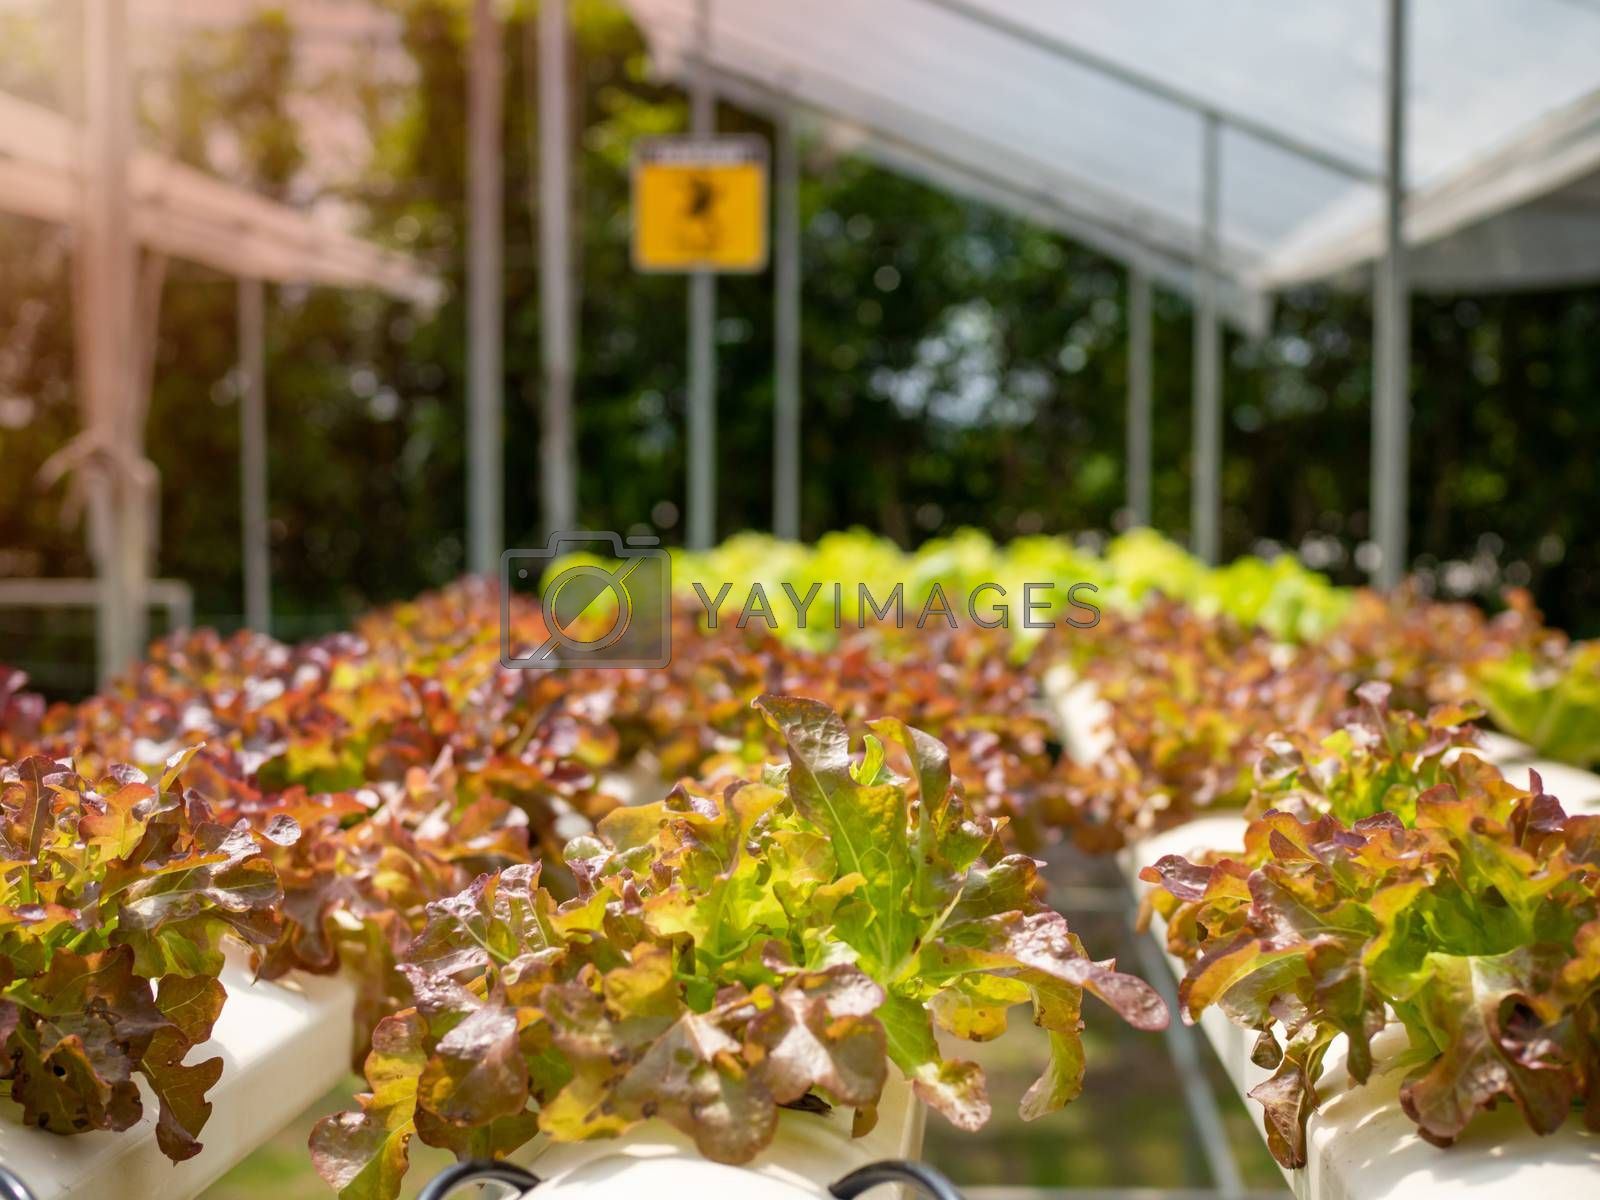 Organic vegetable plots For making healthy food